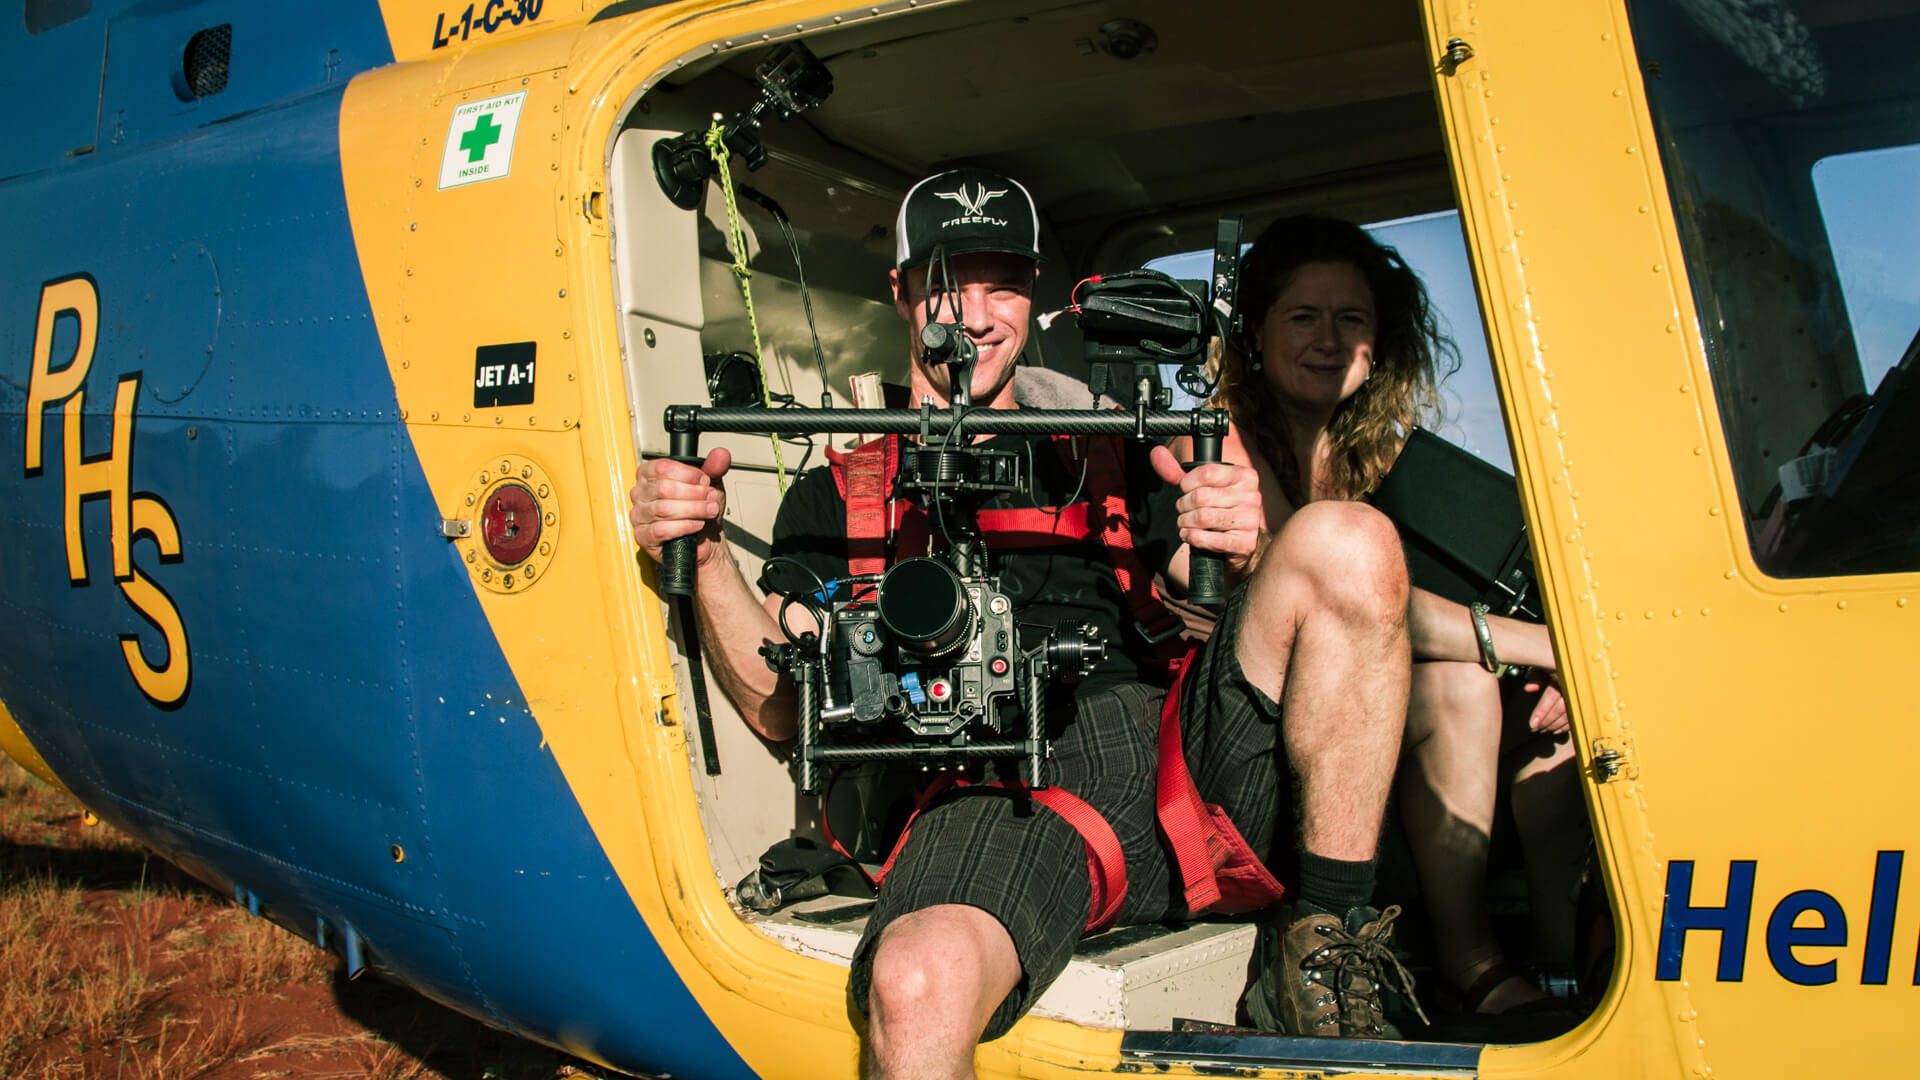 movi-operator-sam-nuttmann-australia-bbc-monsoon-helicopter-operating